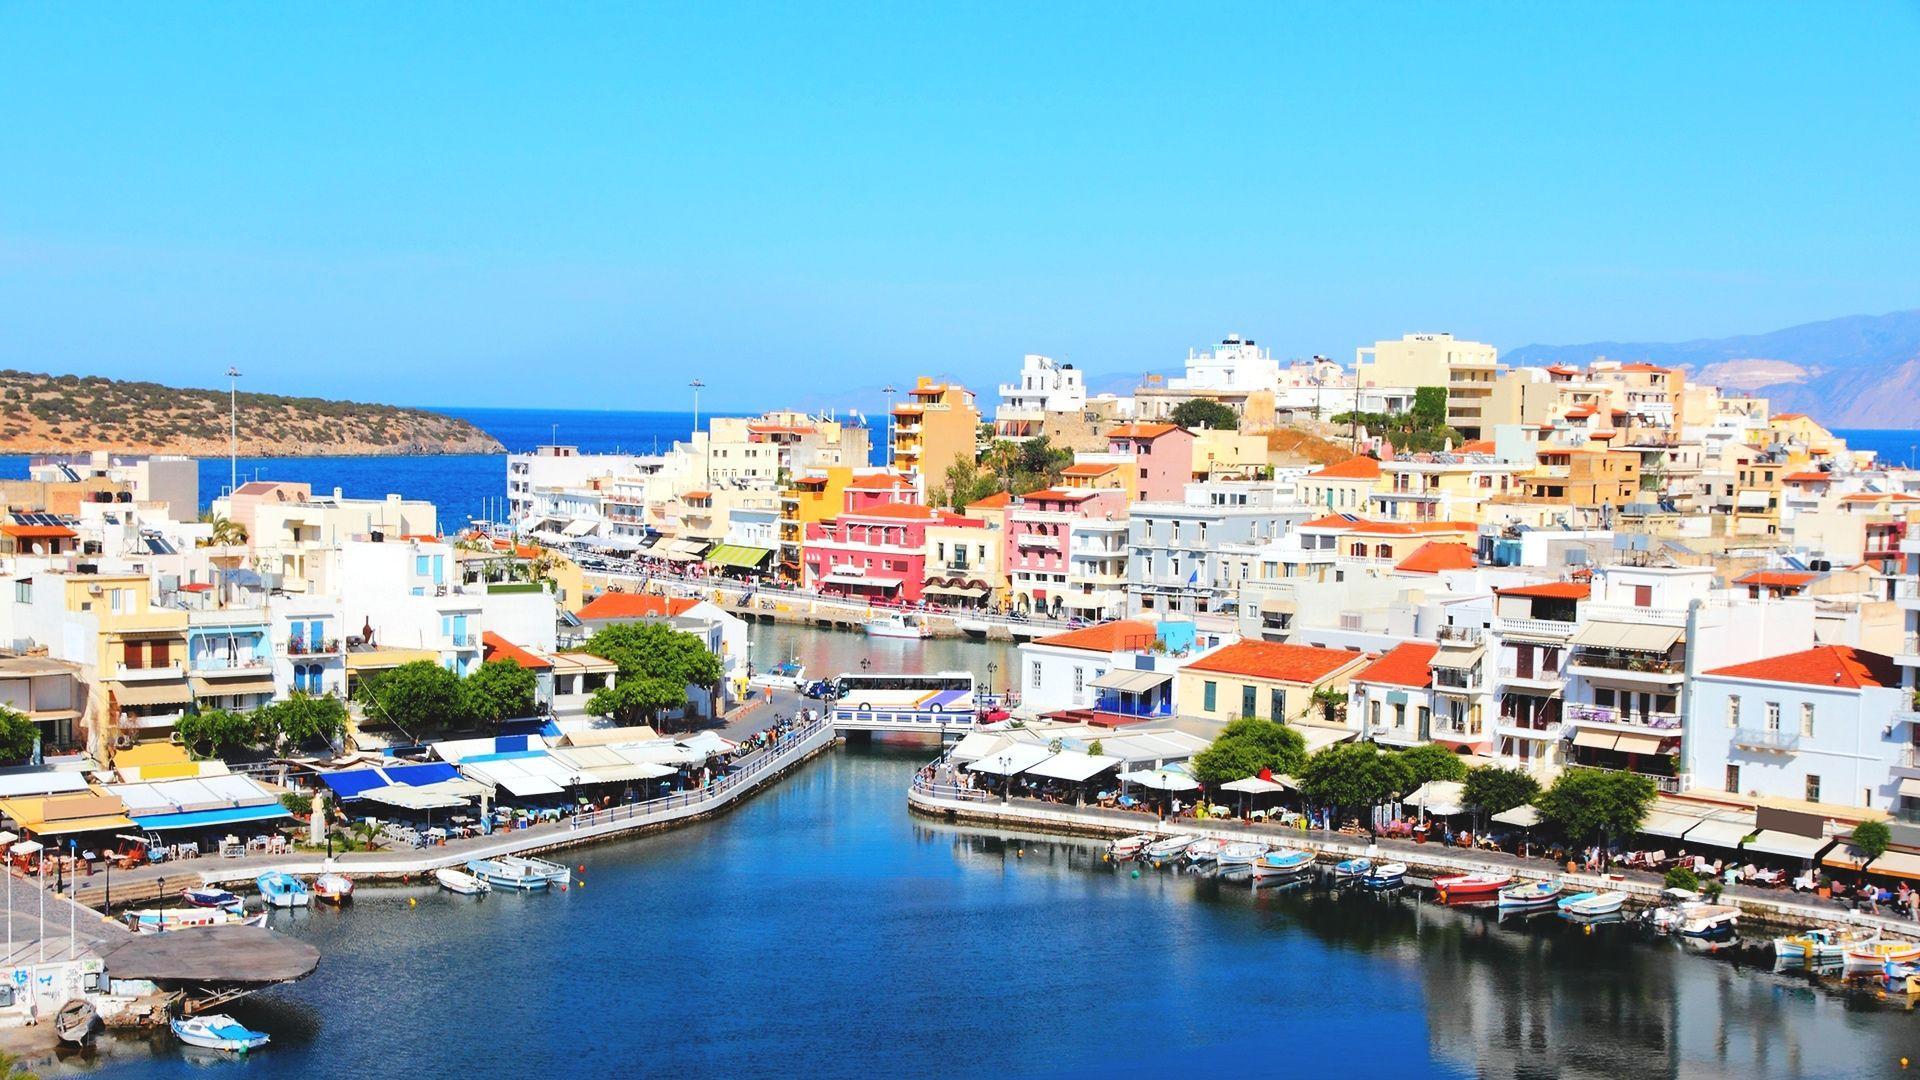 Nuostabioji Kreta